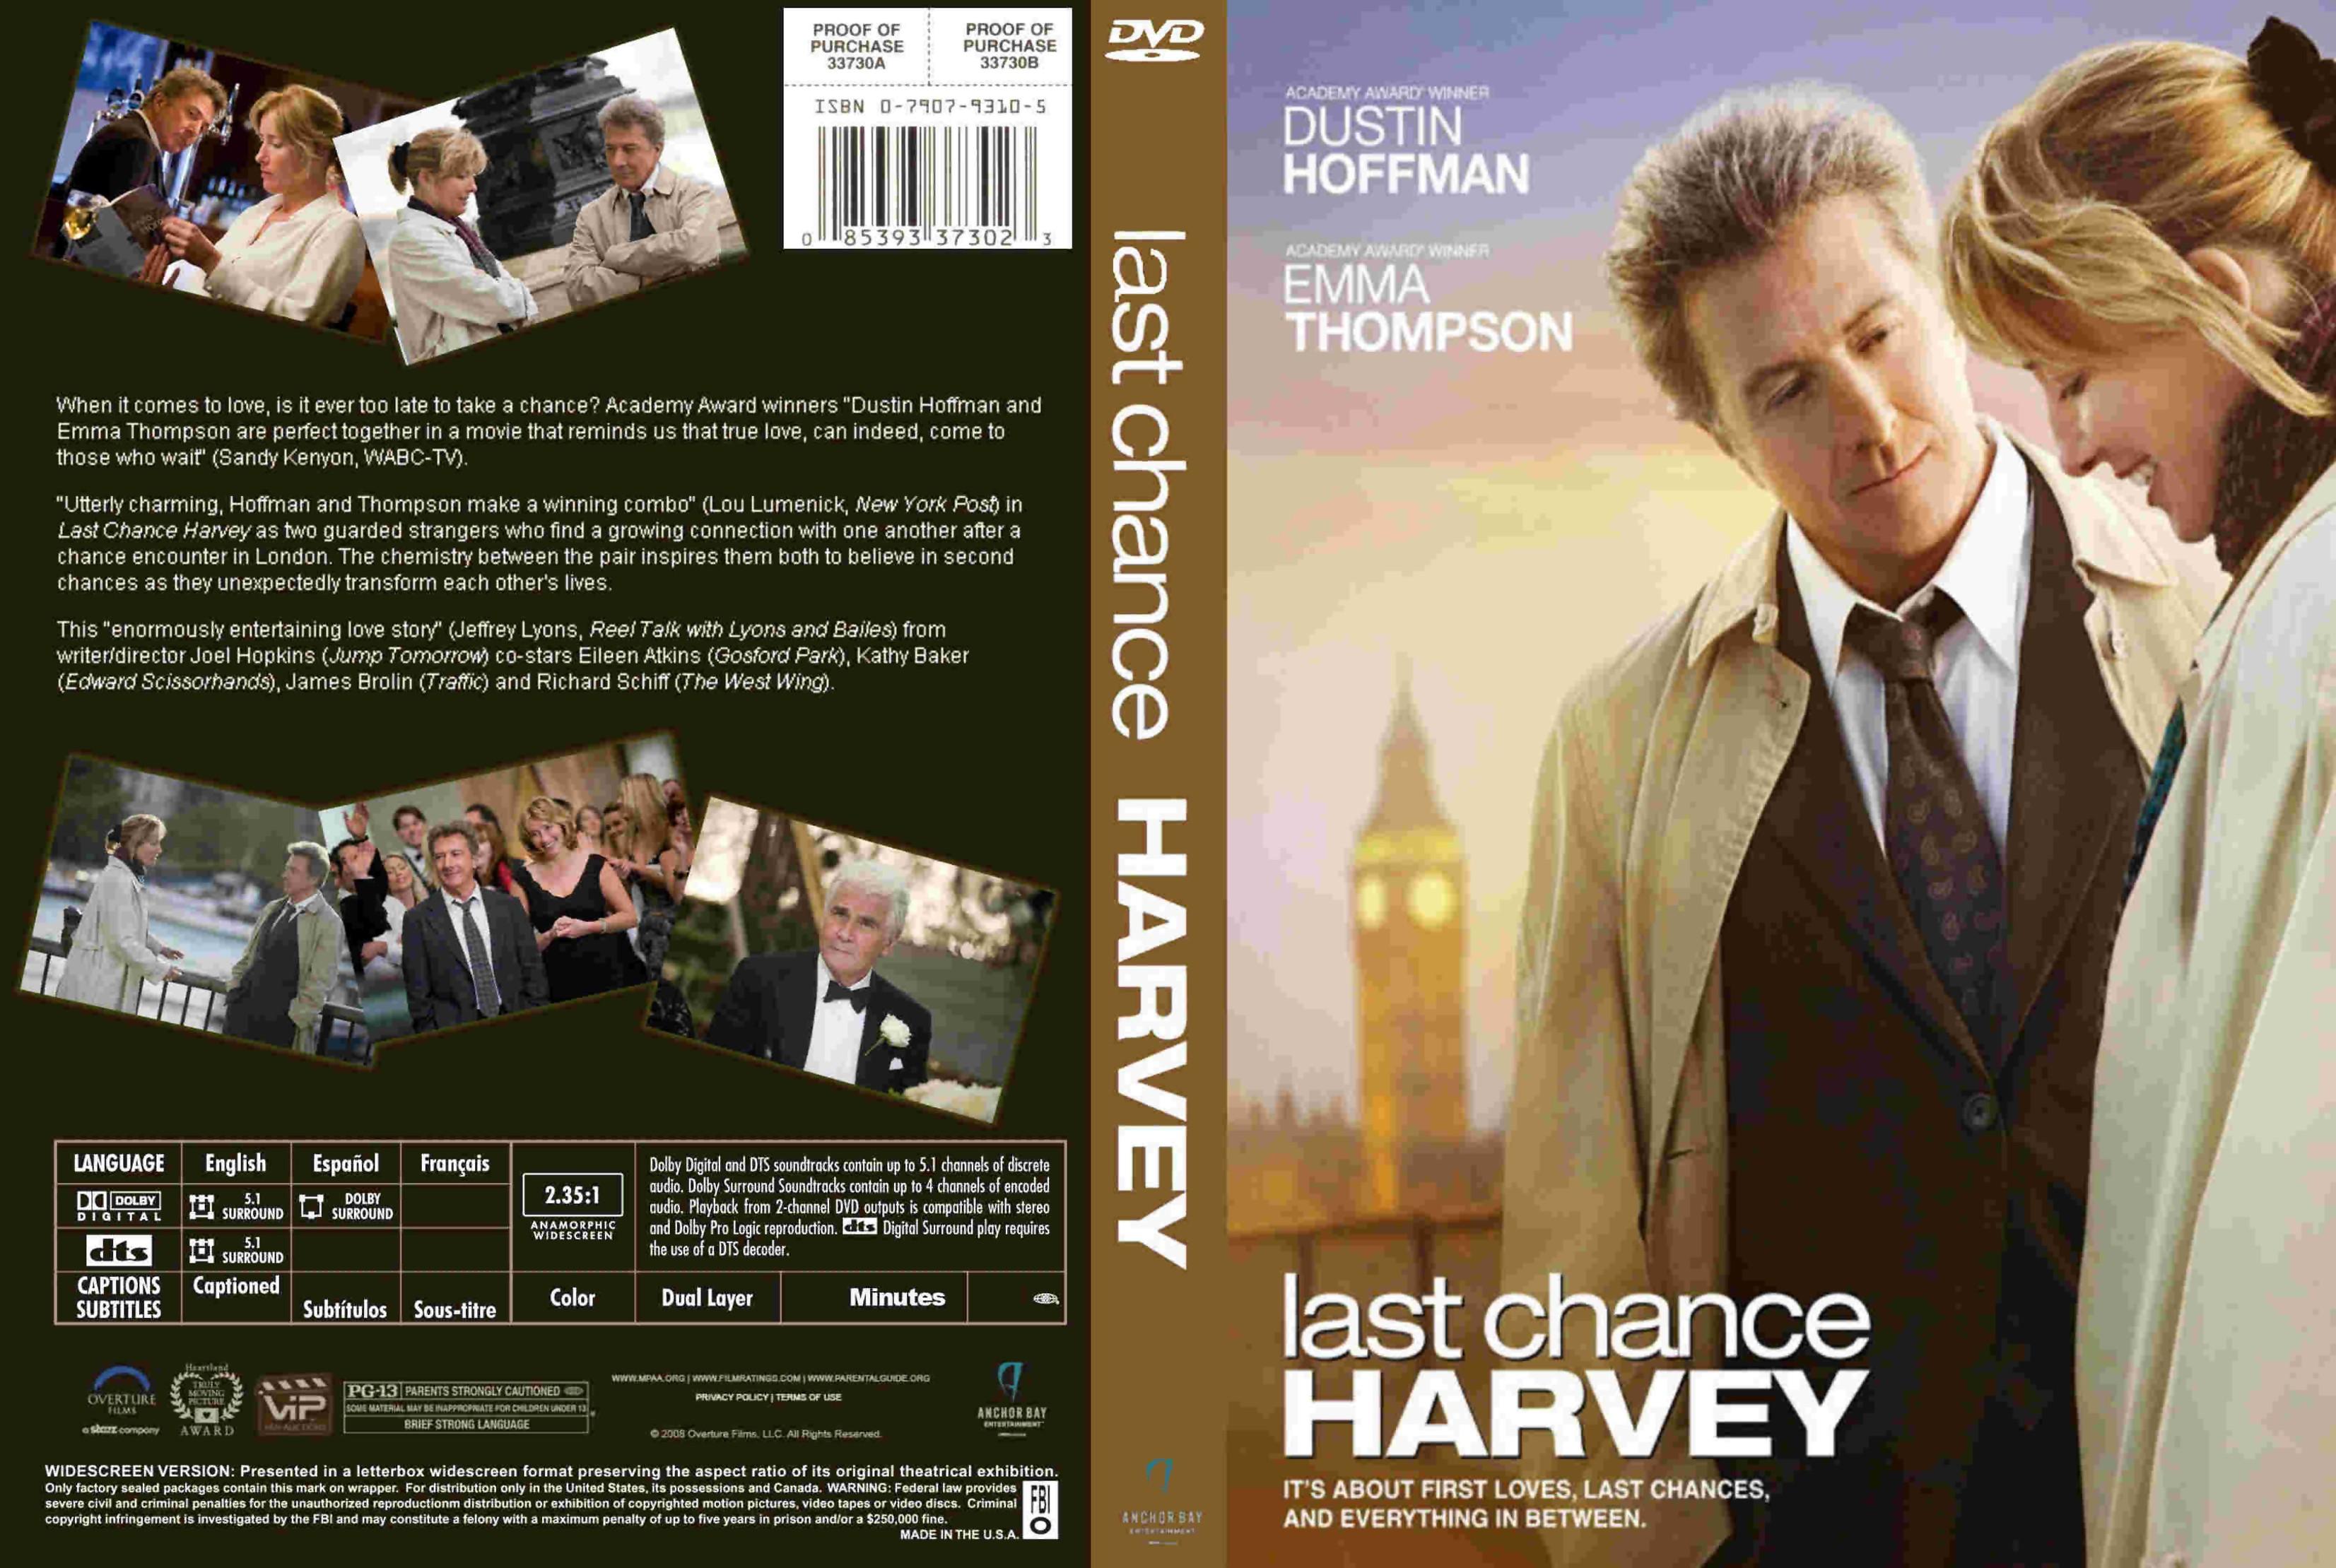 Last movie releases